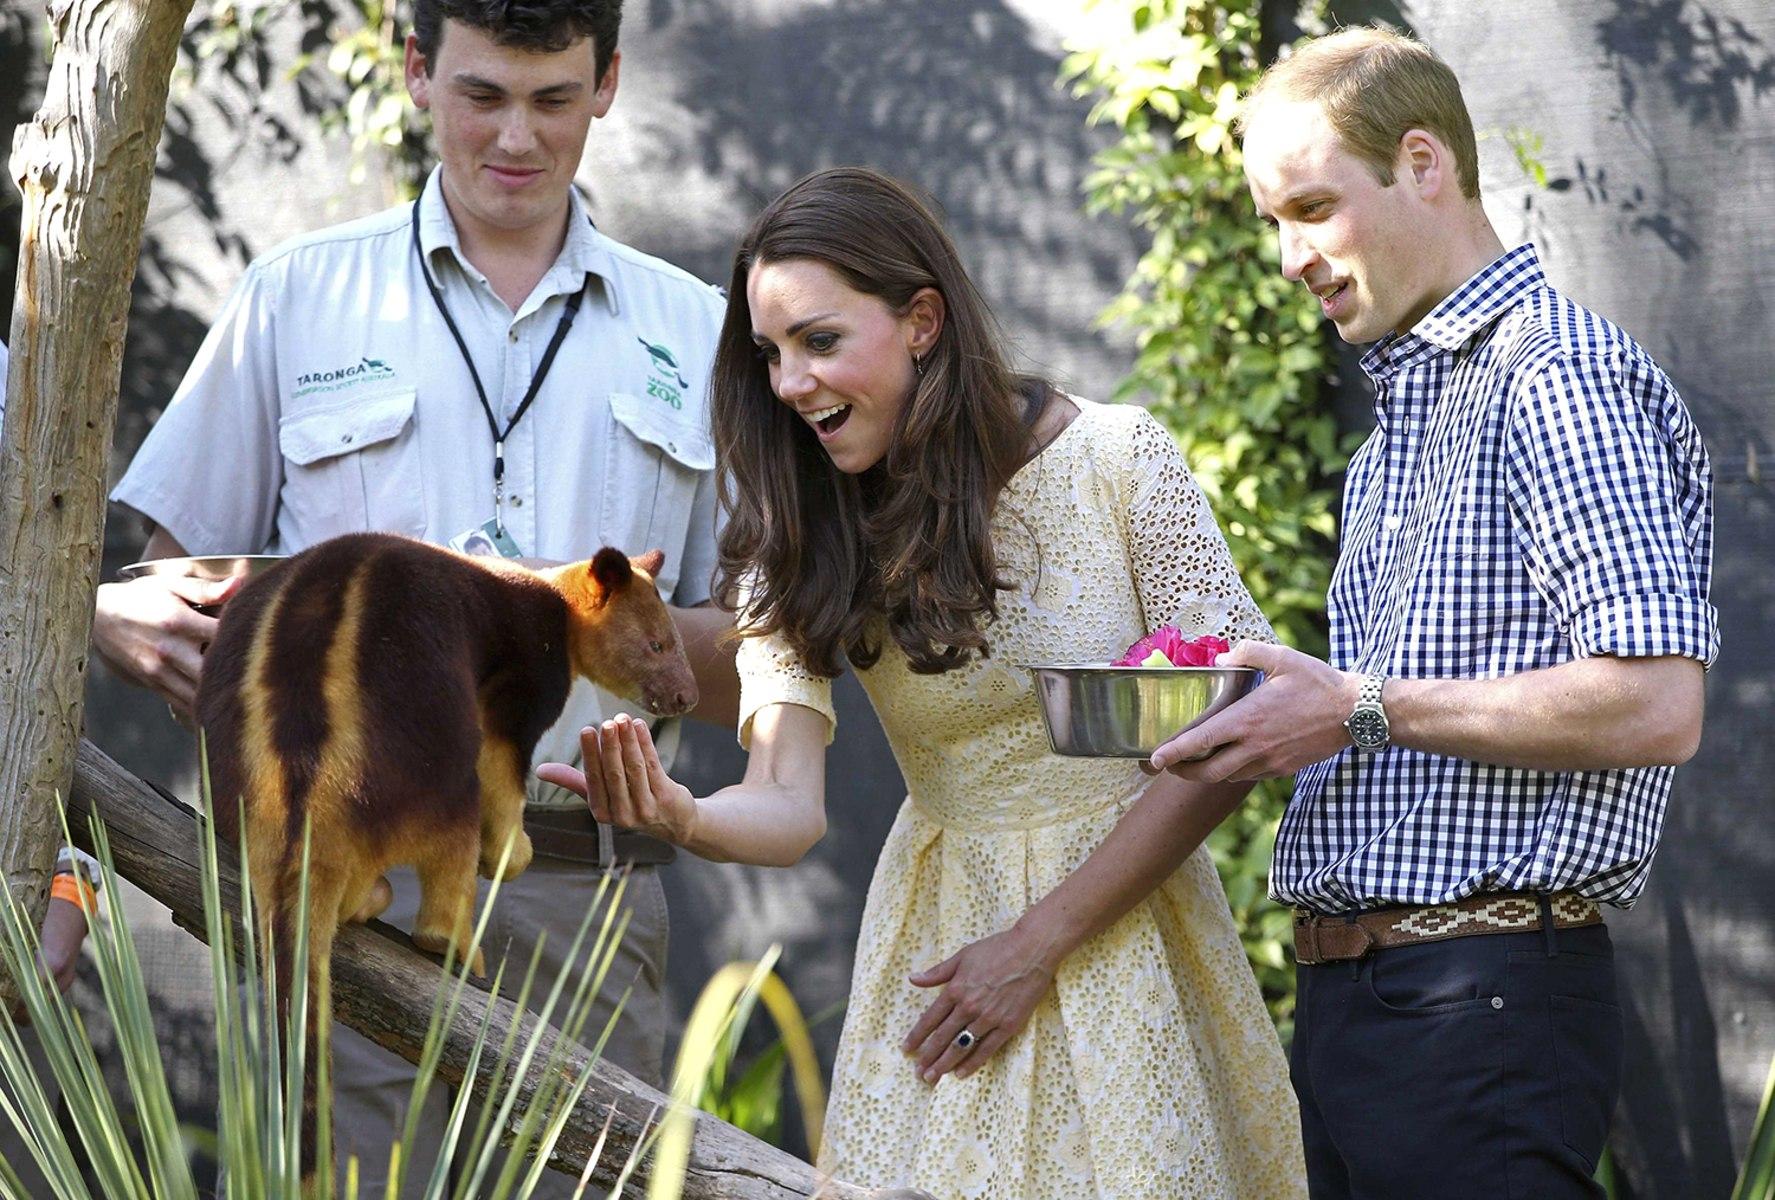 Image: Britain's Prince William And Catherine, Duchess Of Cambridge, Feed A  Tree Kangaroo